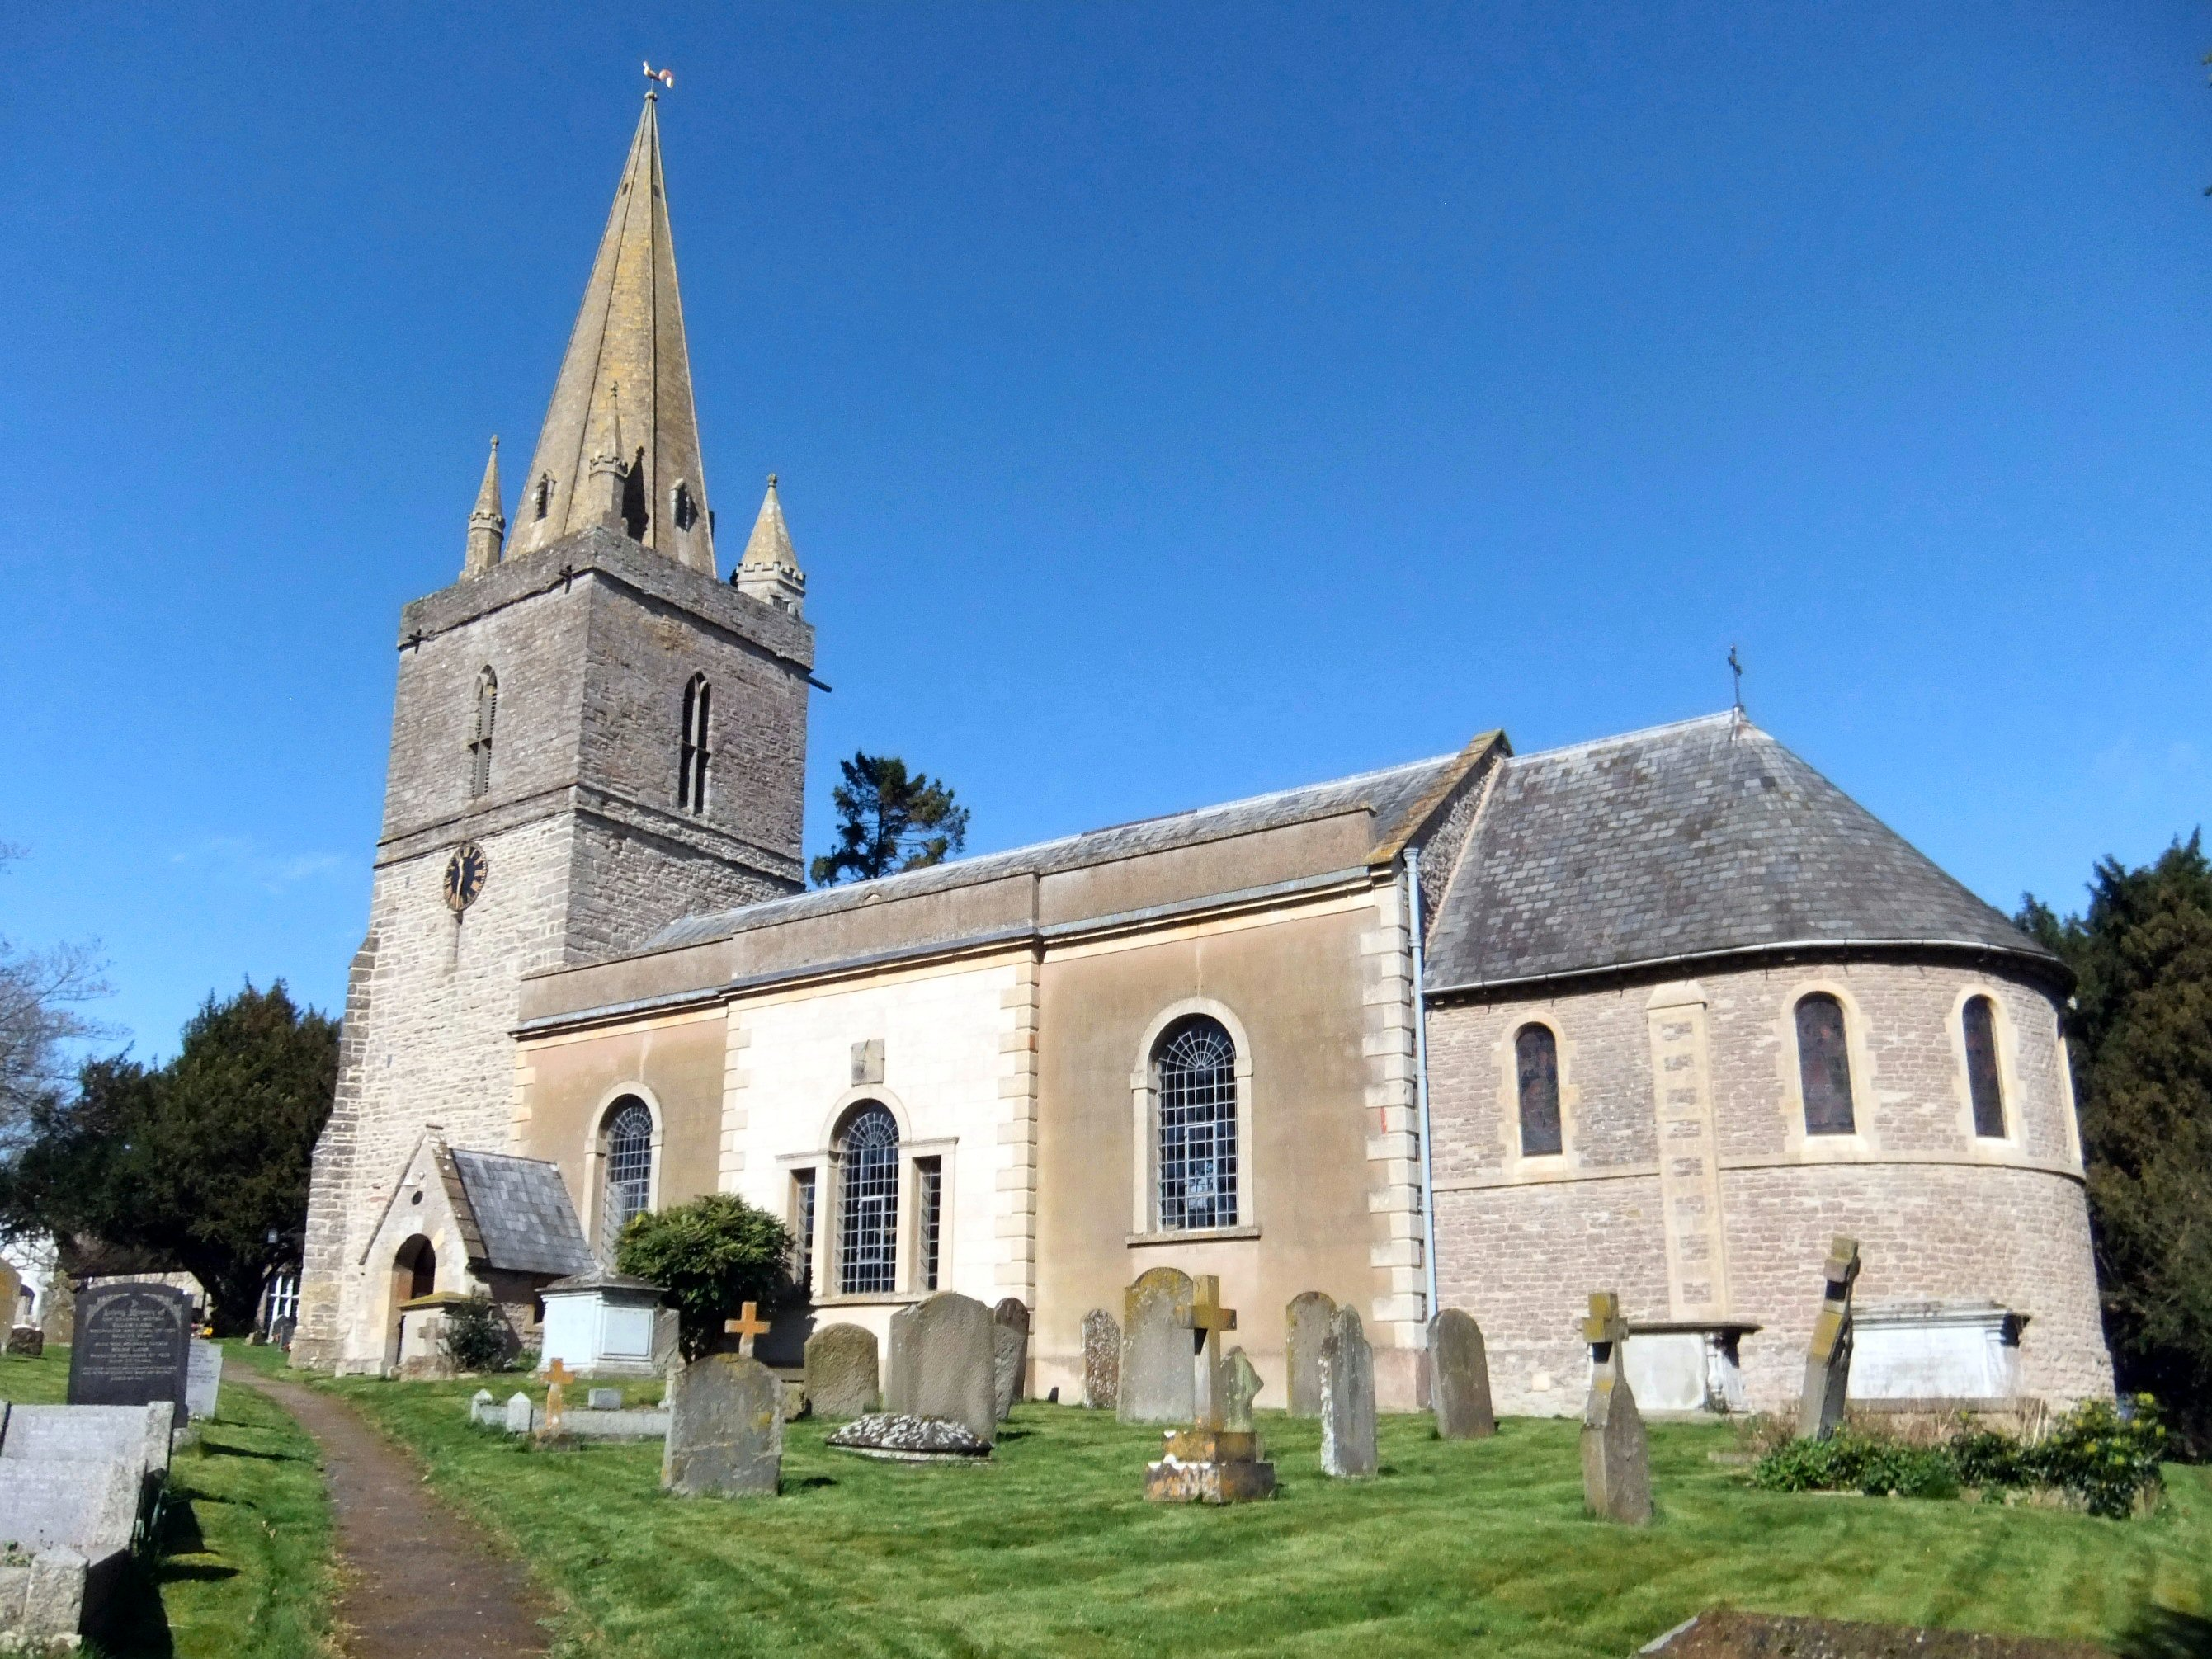 Worcestershire-Longdon-St-Mary-Exterior-2185[1]